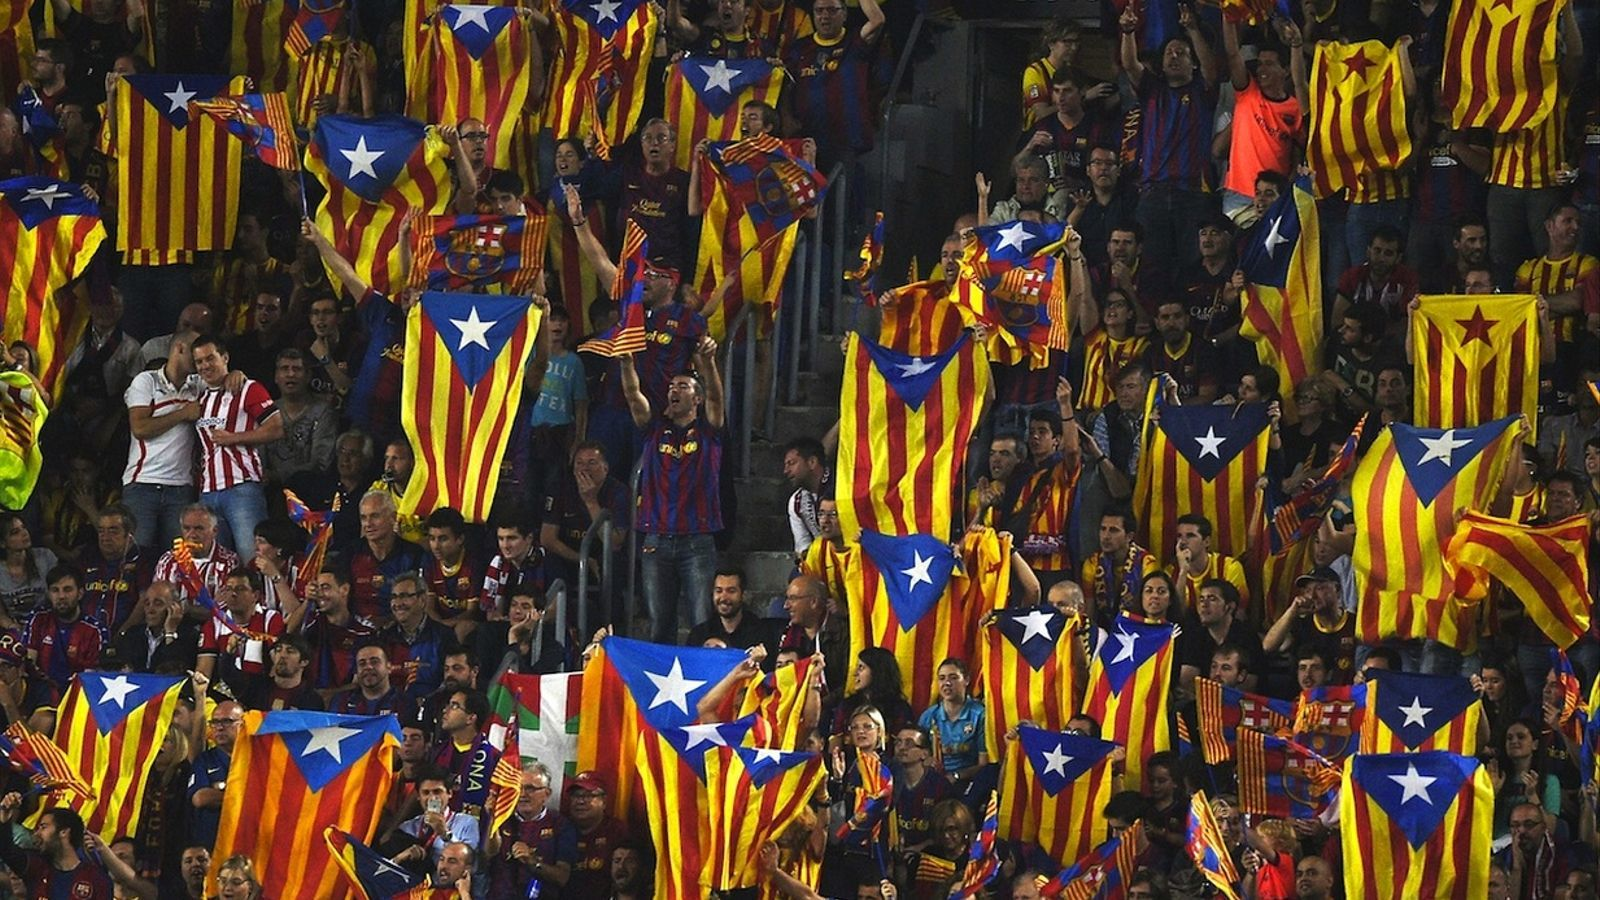 Estelades al Camp Nou durant la final de la Copa del Rei / LLUÍS GENÉ / AFP